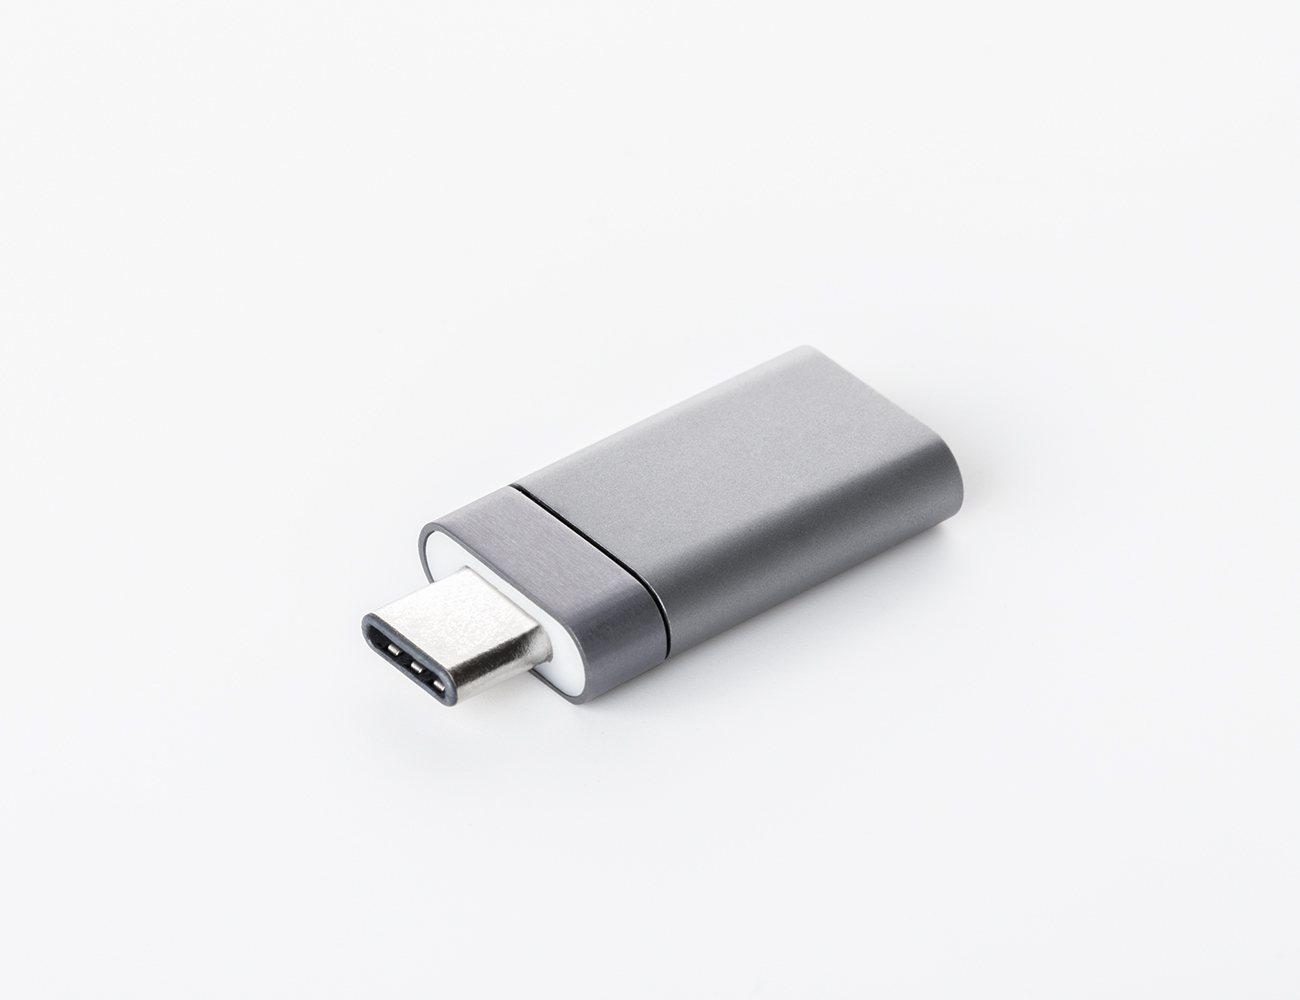 Snapnator – Your MacBook Snap Feature is Back!